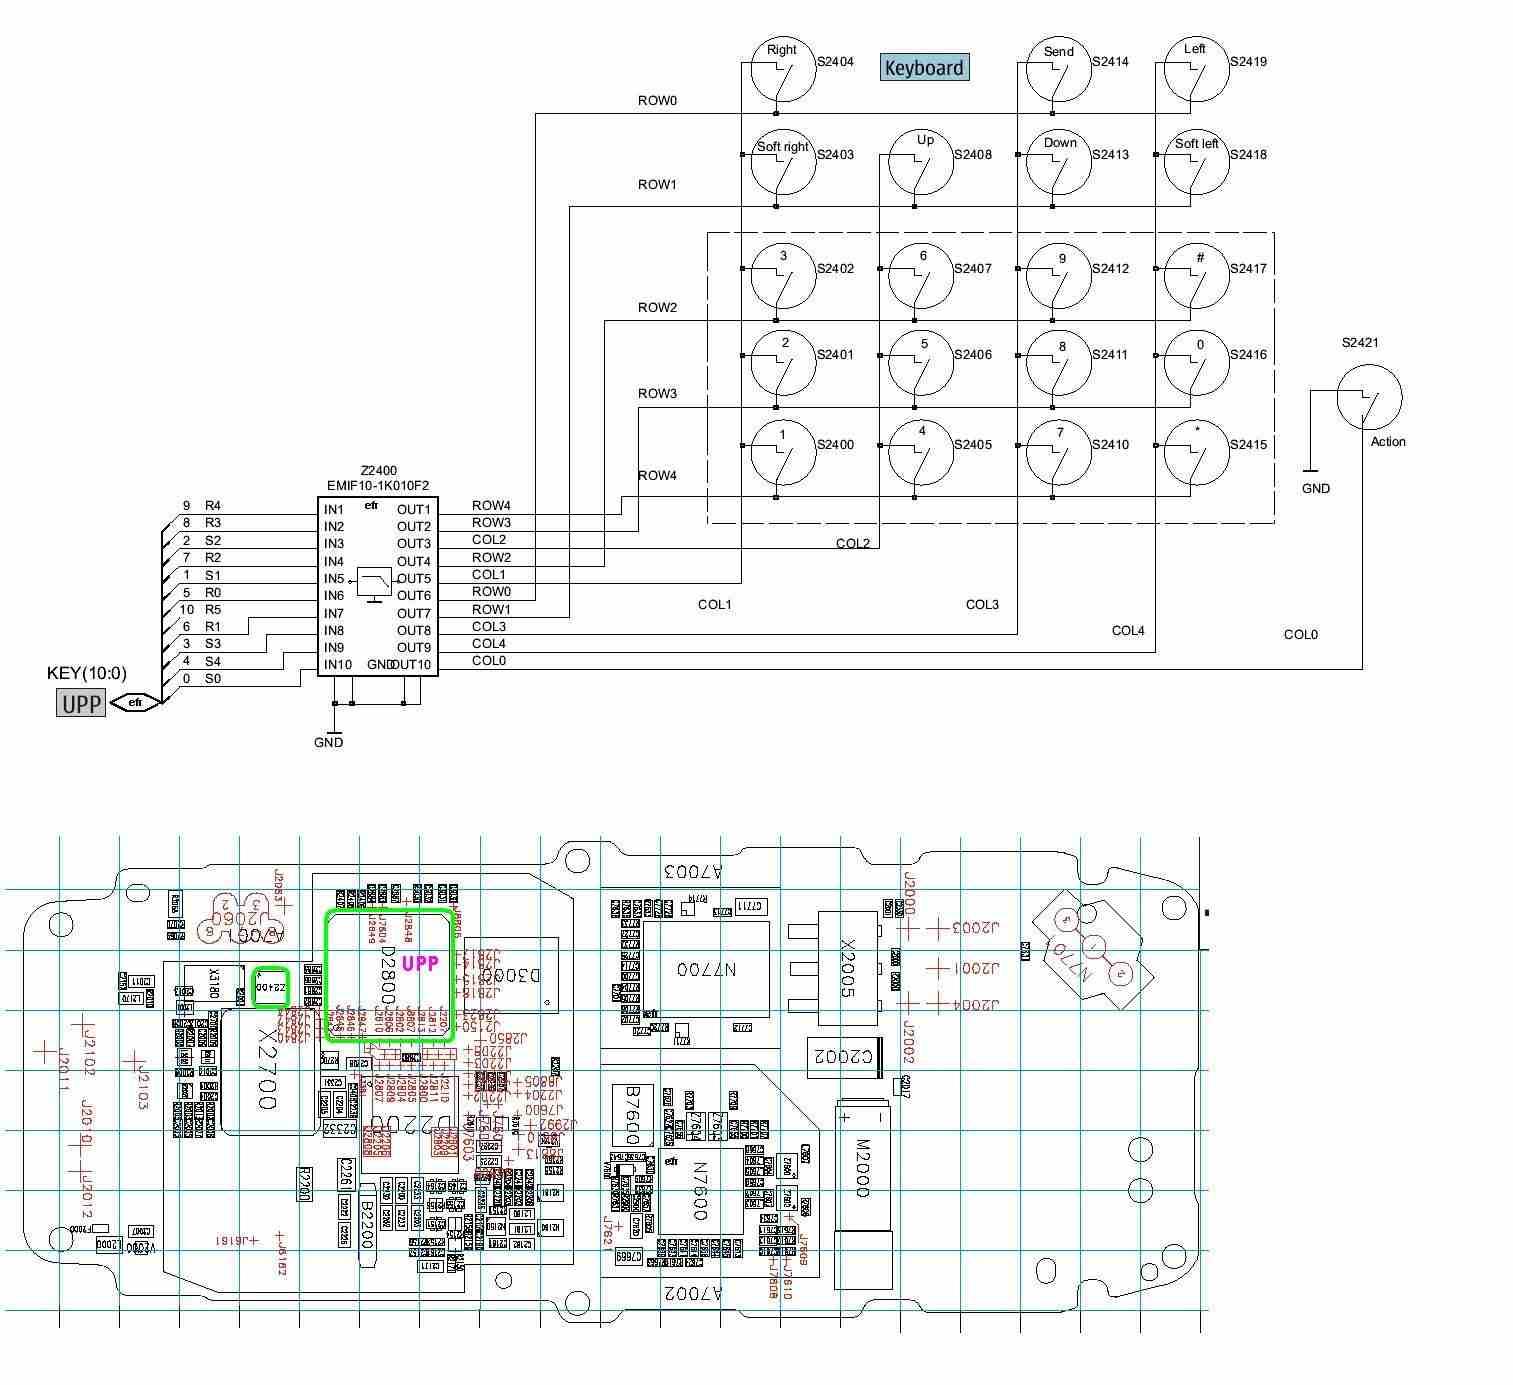 Nokia 1600 Diogram To Keypad Solution